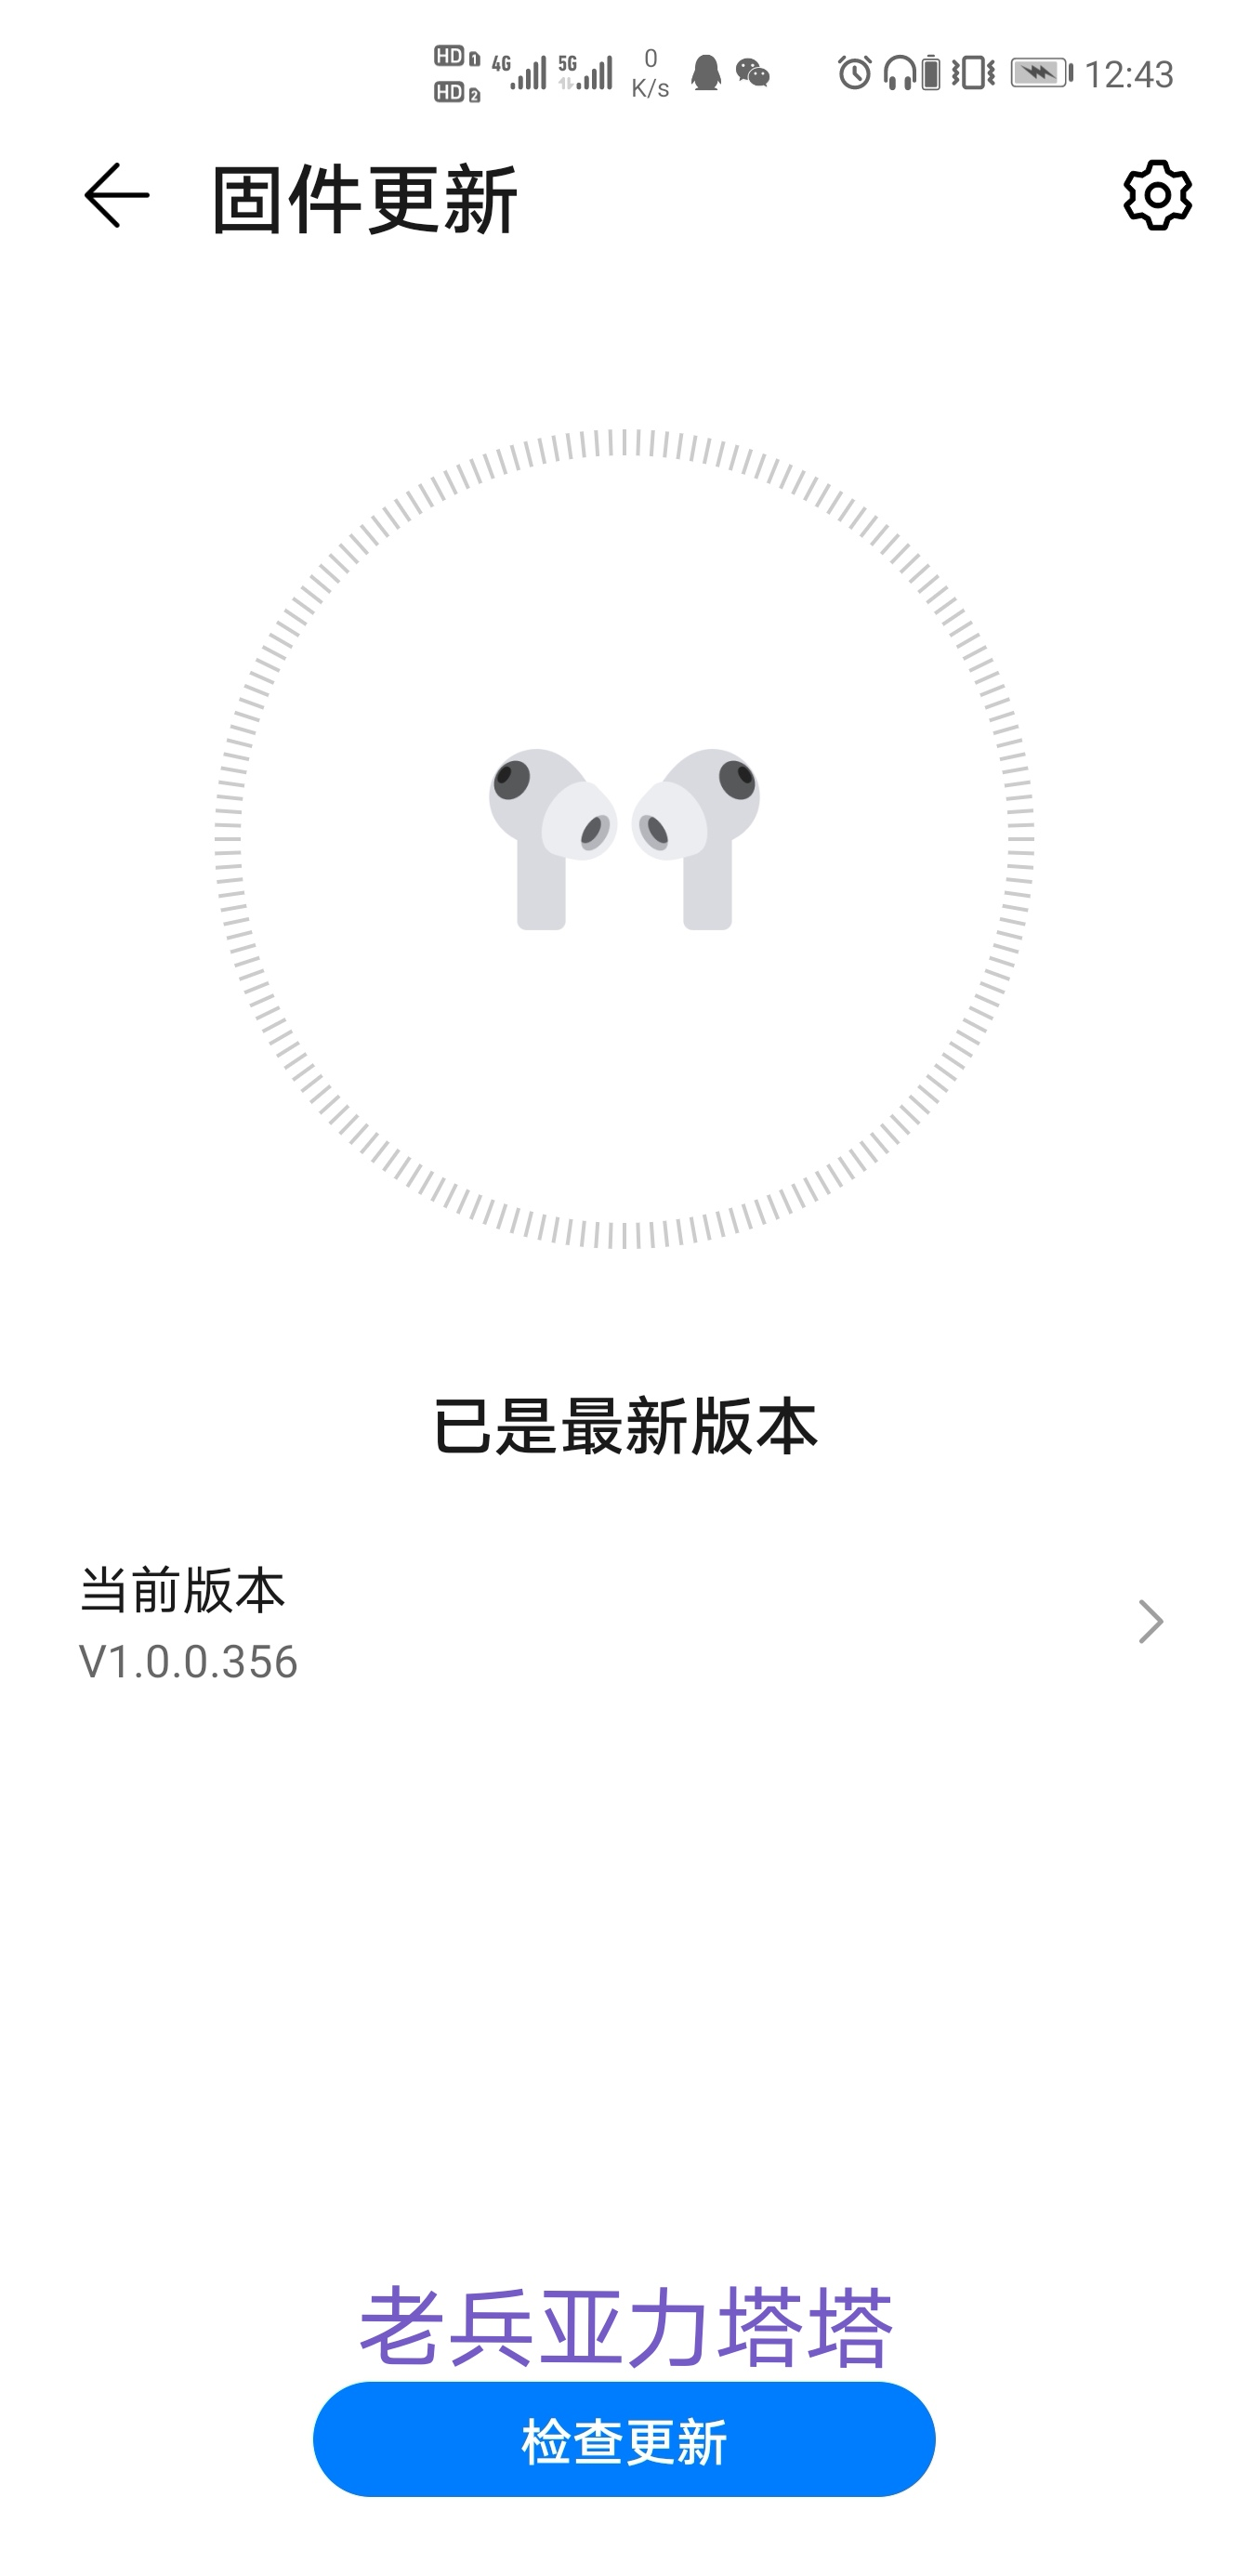 Screenshot_20210329_124329_com.huawei.smarthome_edit_45569410648254.jpg